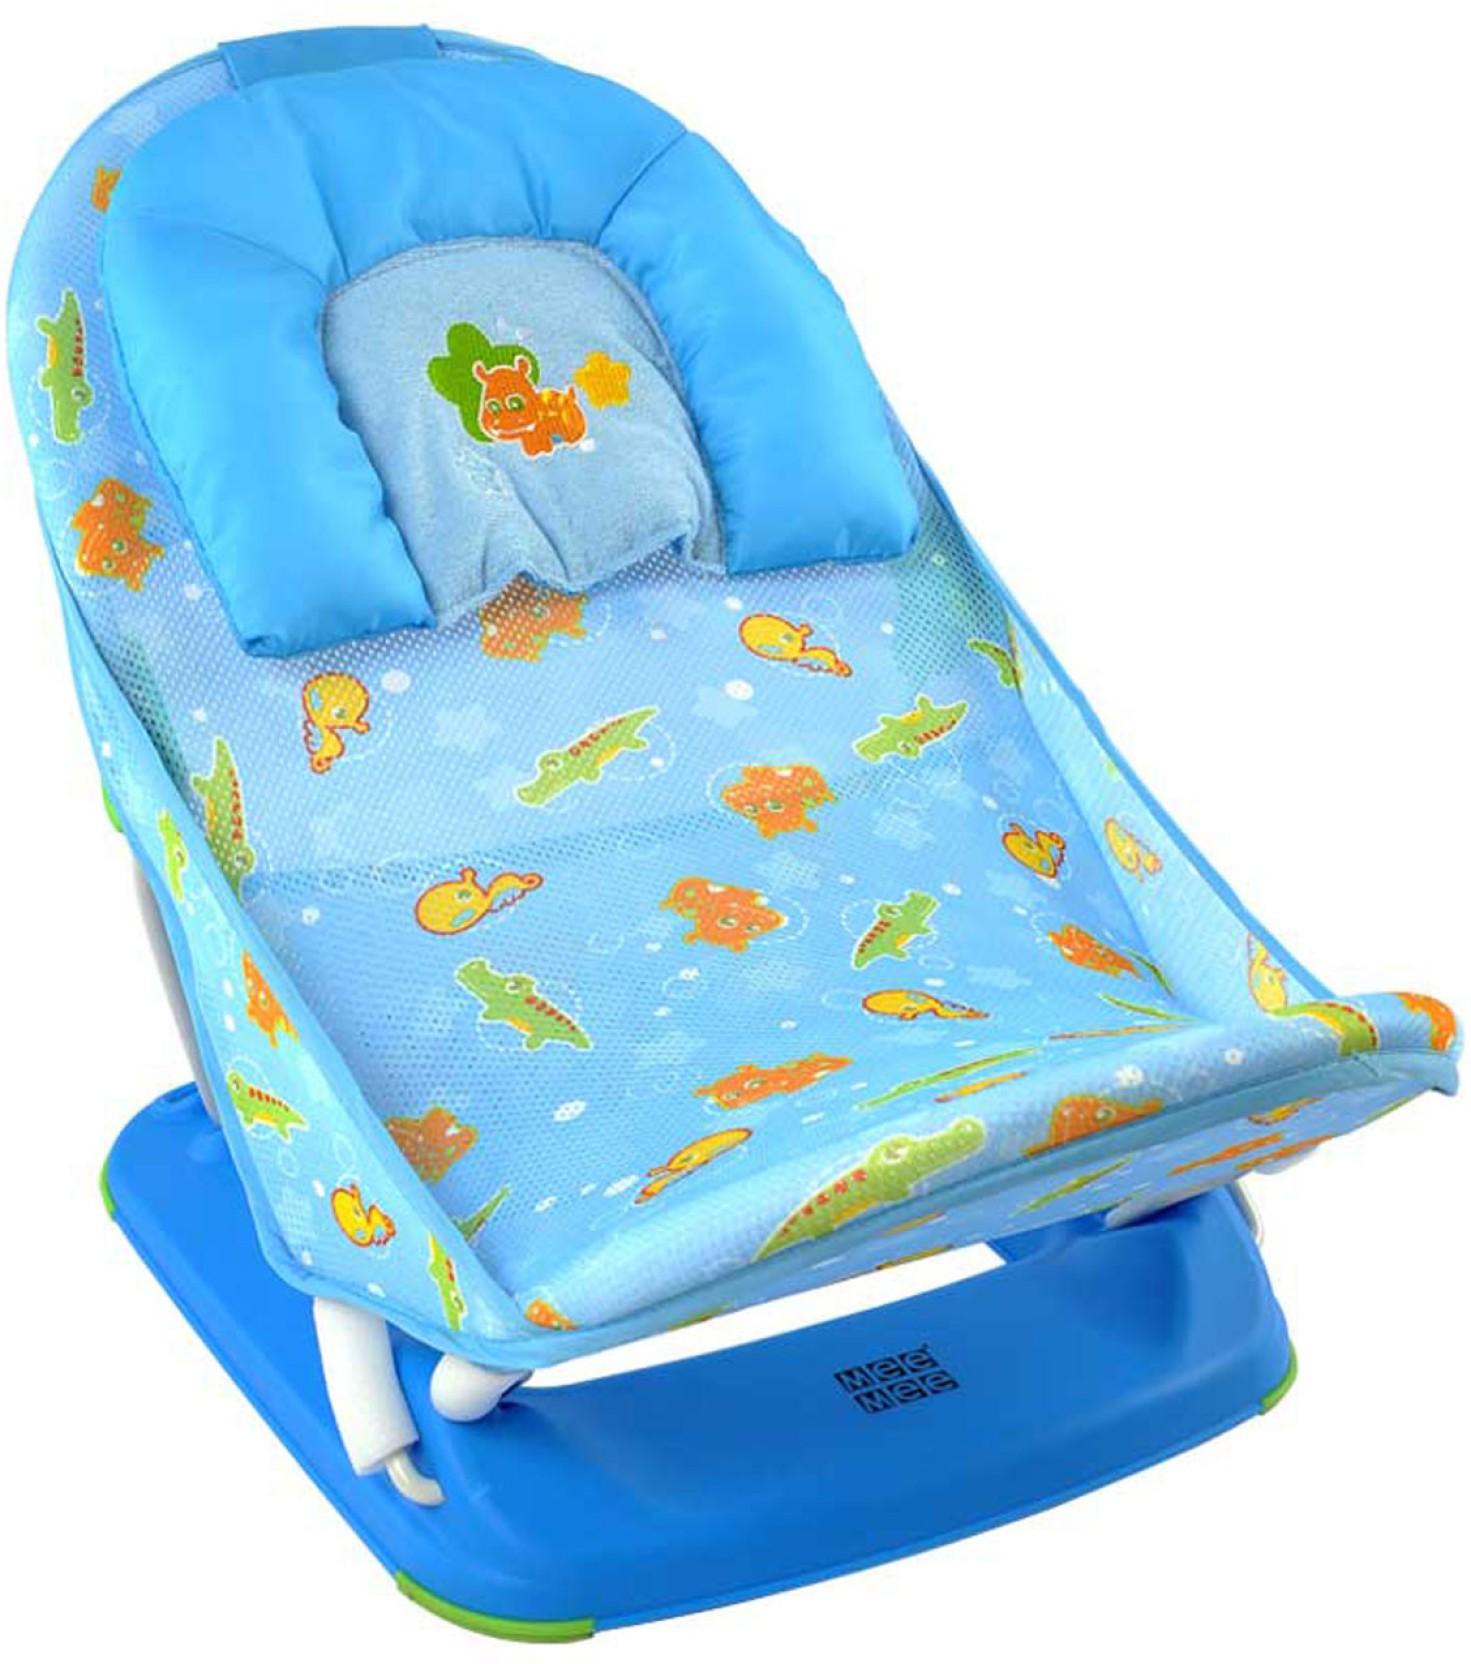 MeeMee Bather Baby Bath Seat Price in India - Buy MeeMee Bather Baby ...